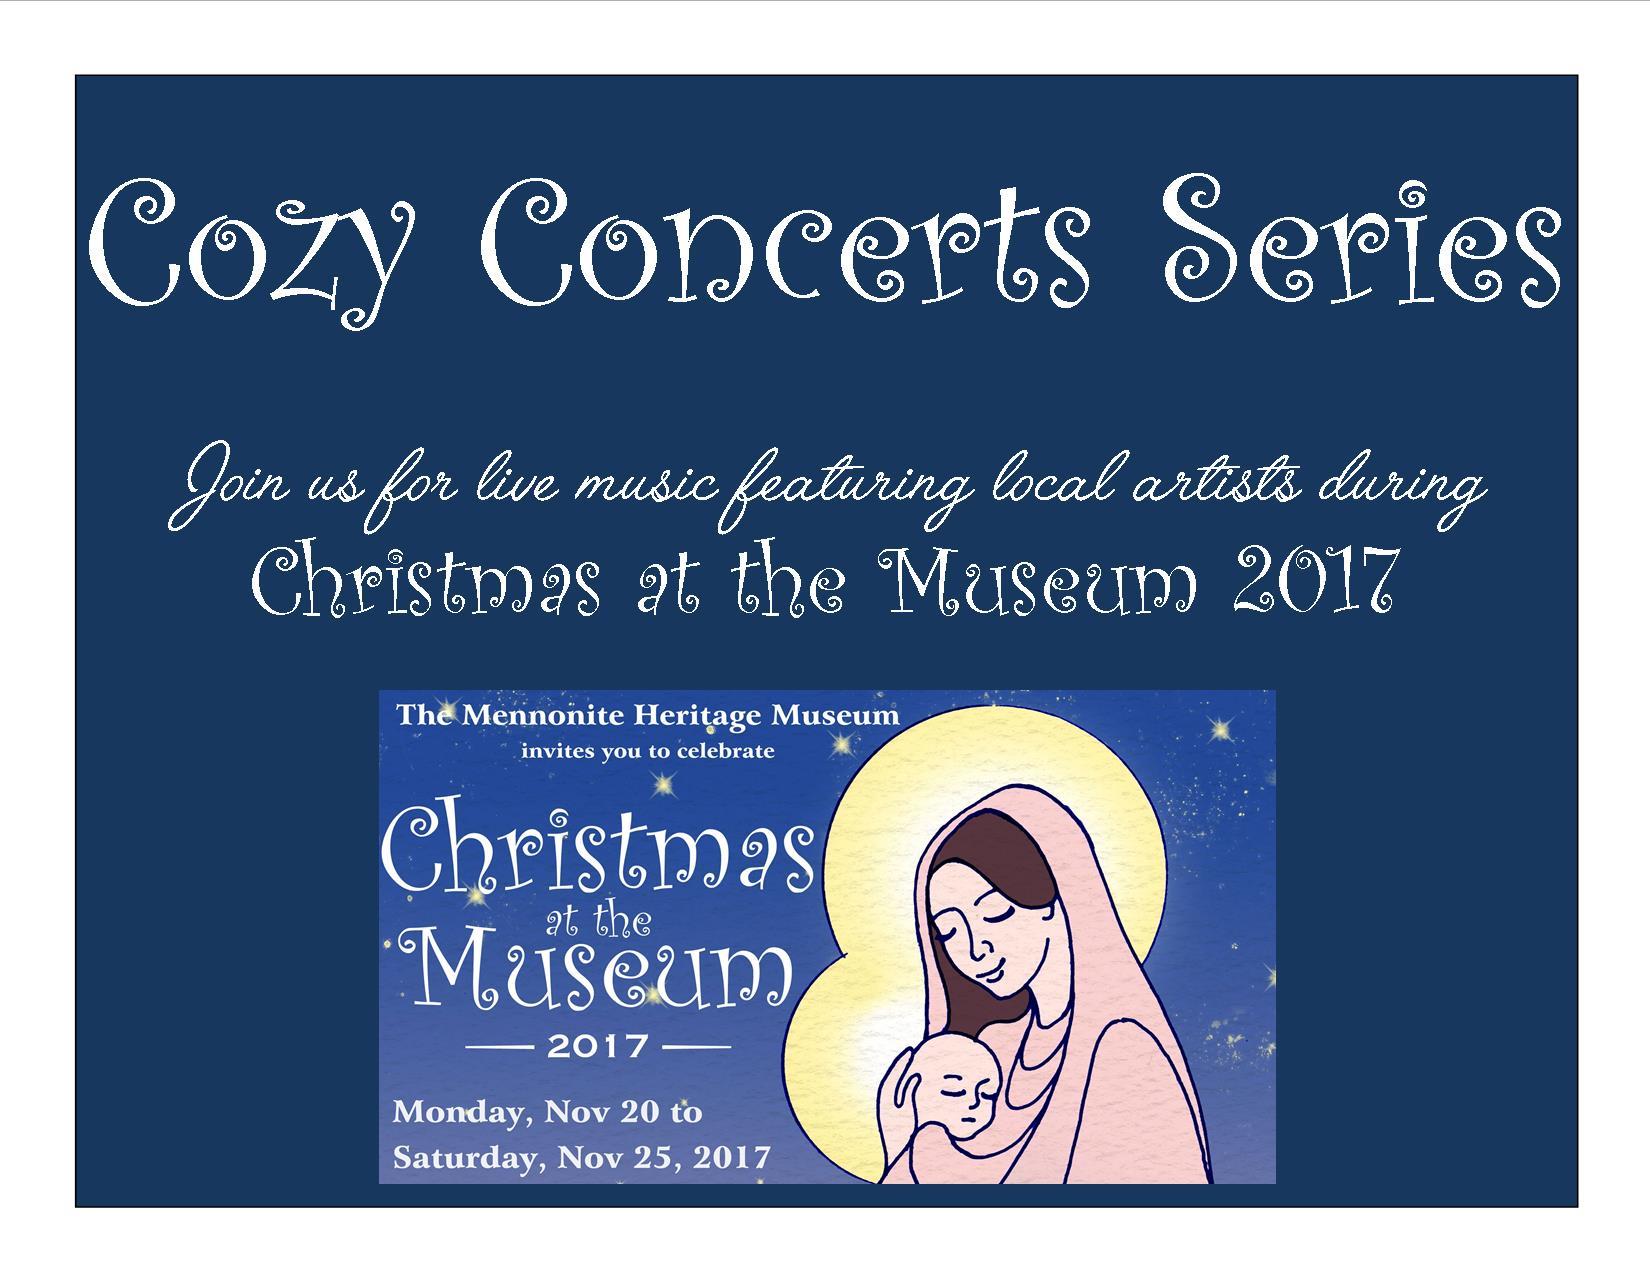 Cozy Concert Series